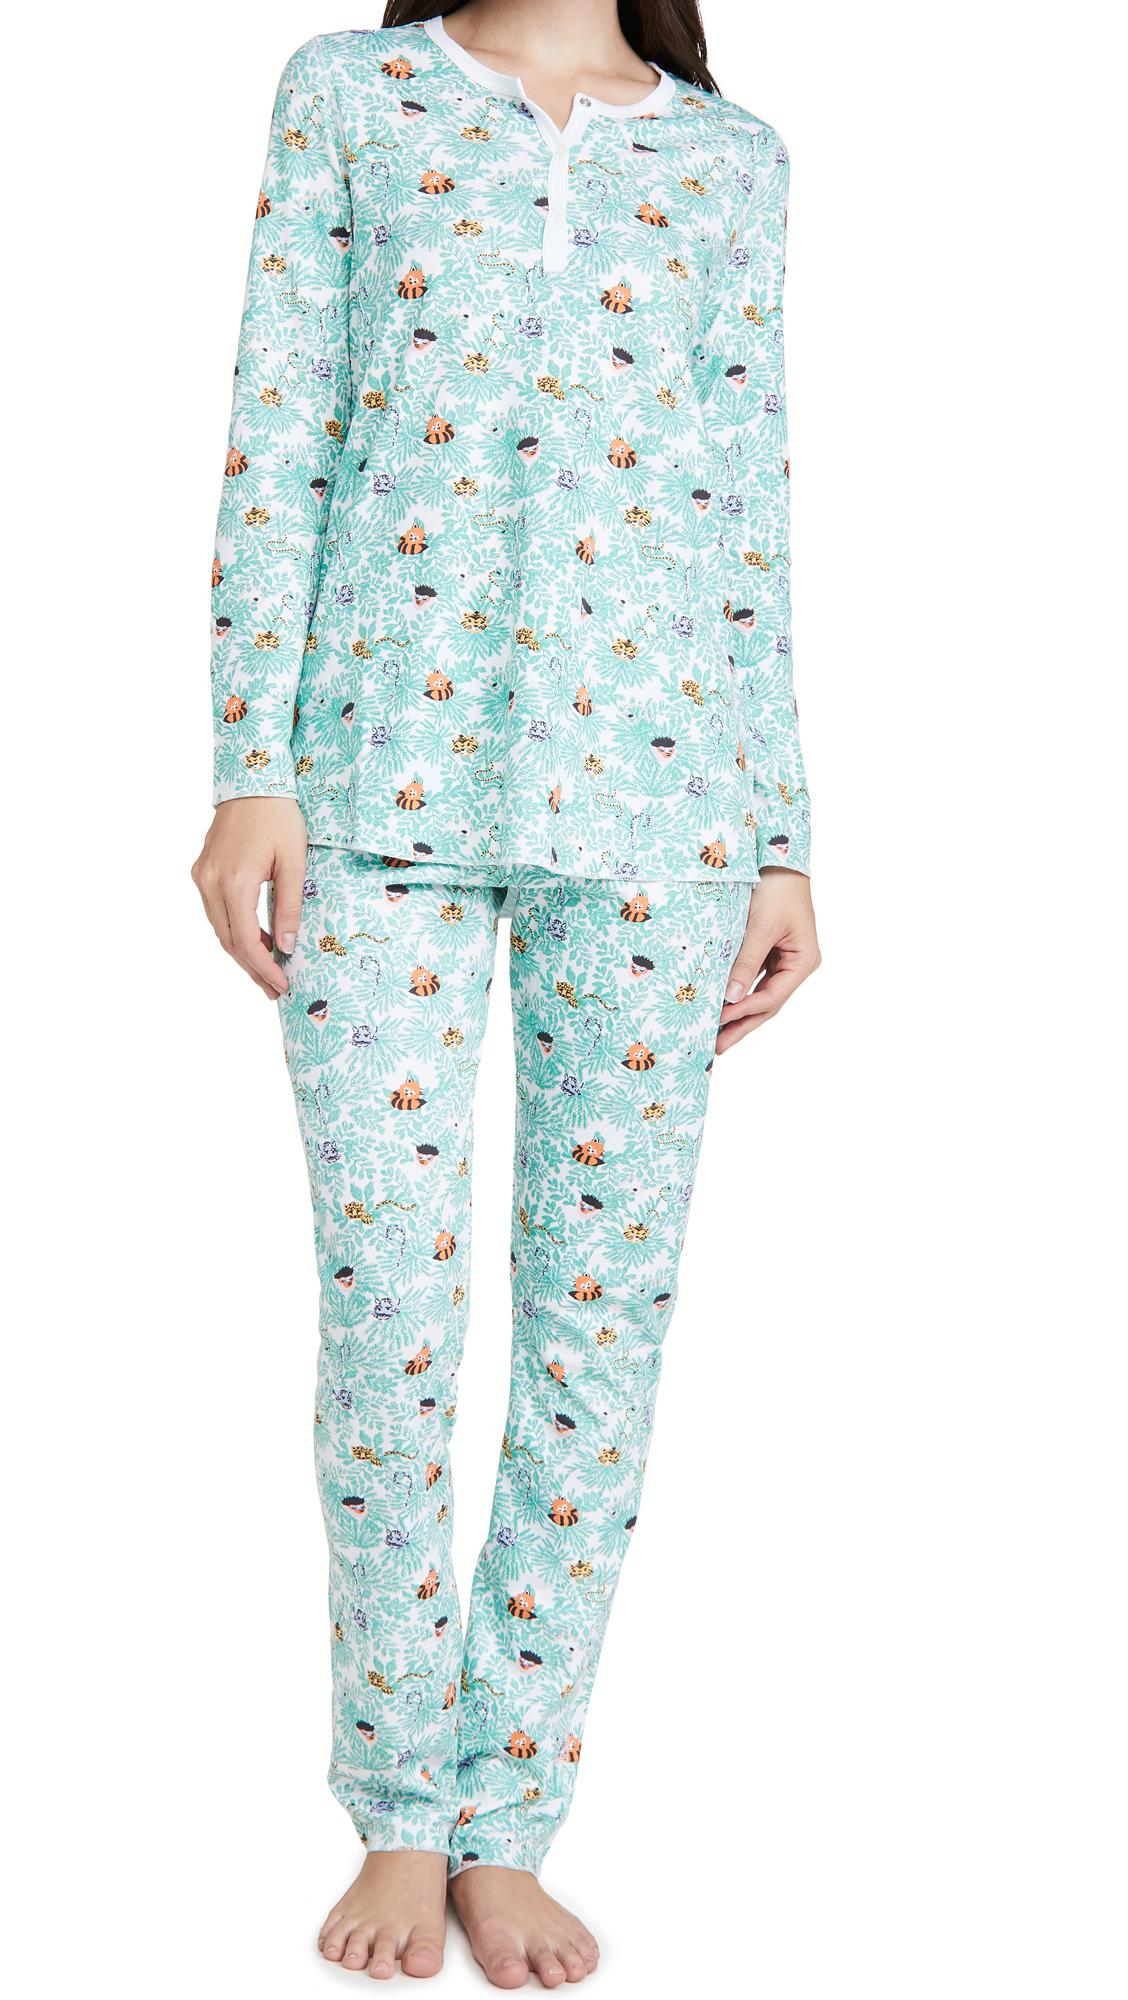 Roller Rabbit Heads & Tails Pajamas